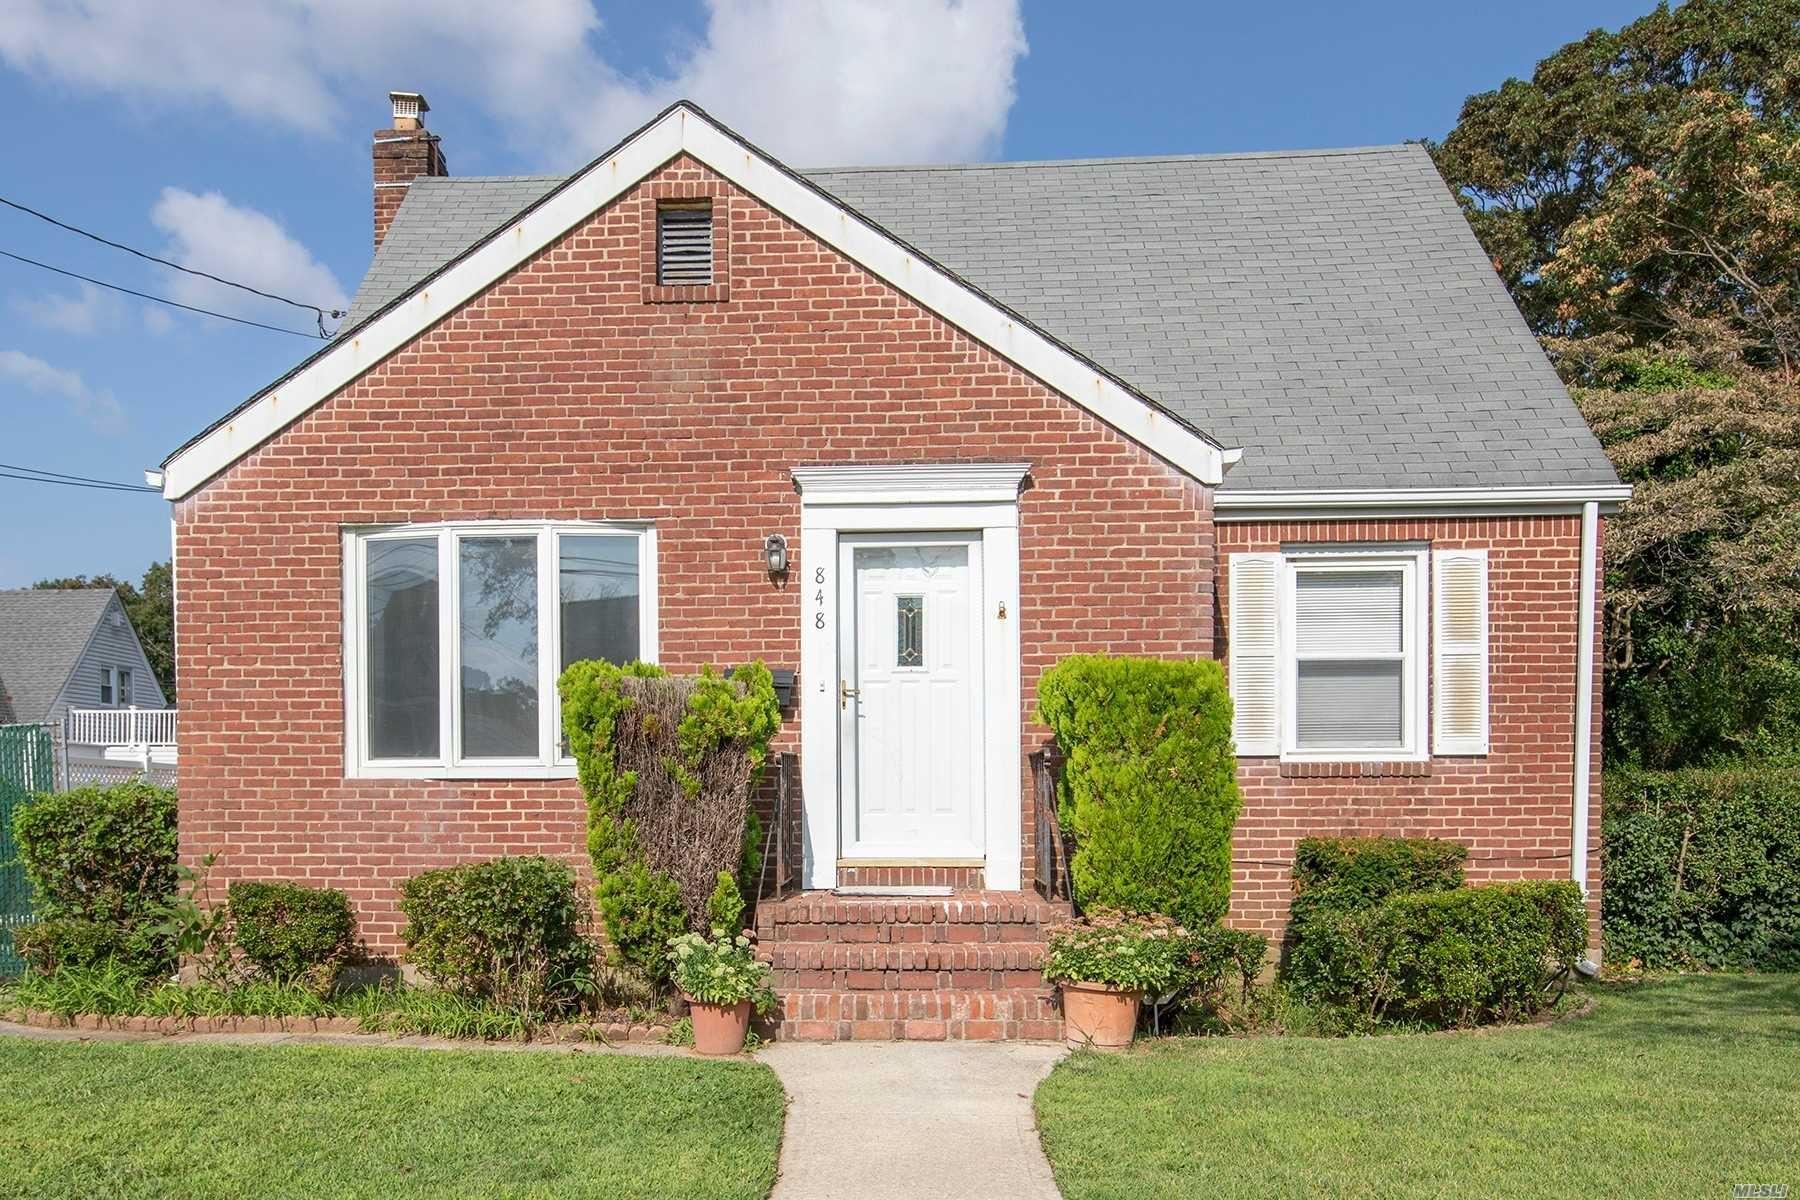 848 Bradley Street, West Hempstead, NY 11552 - MLS#: 3247206